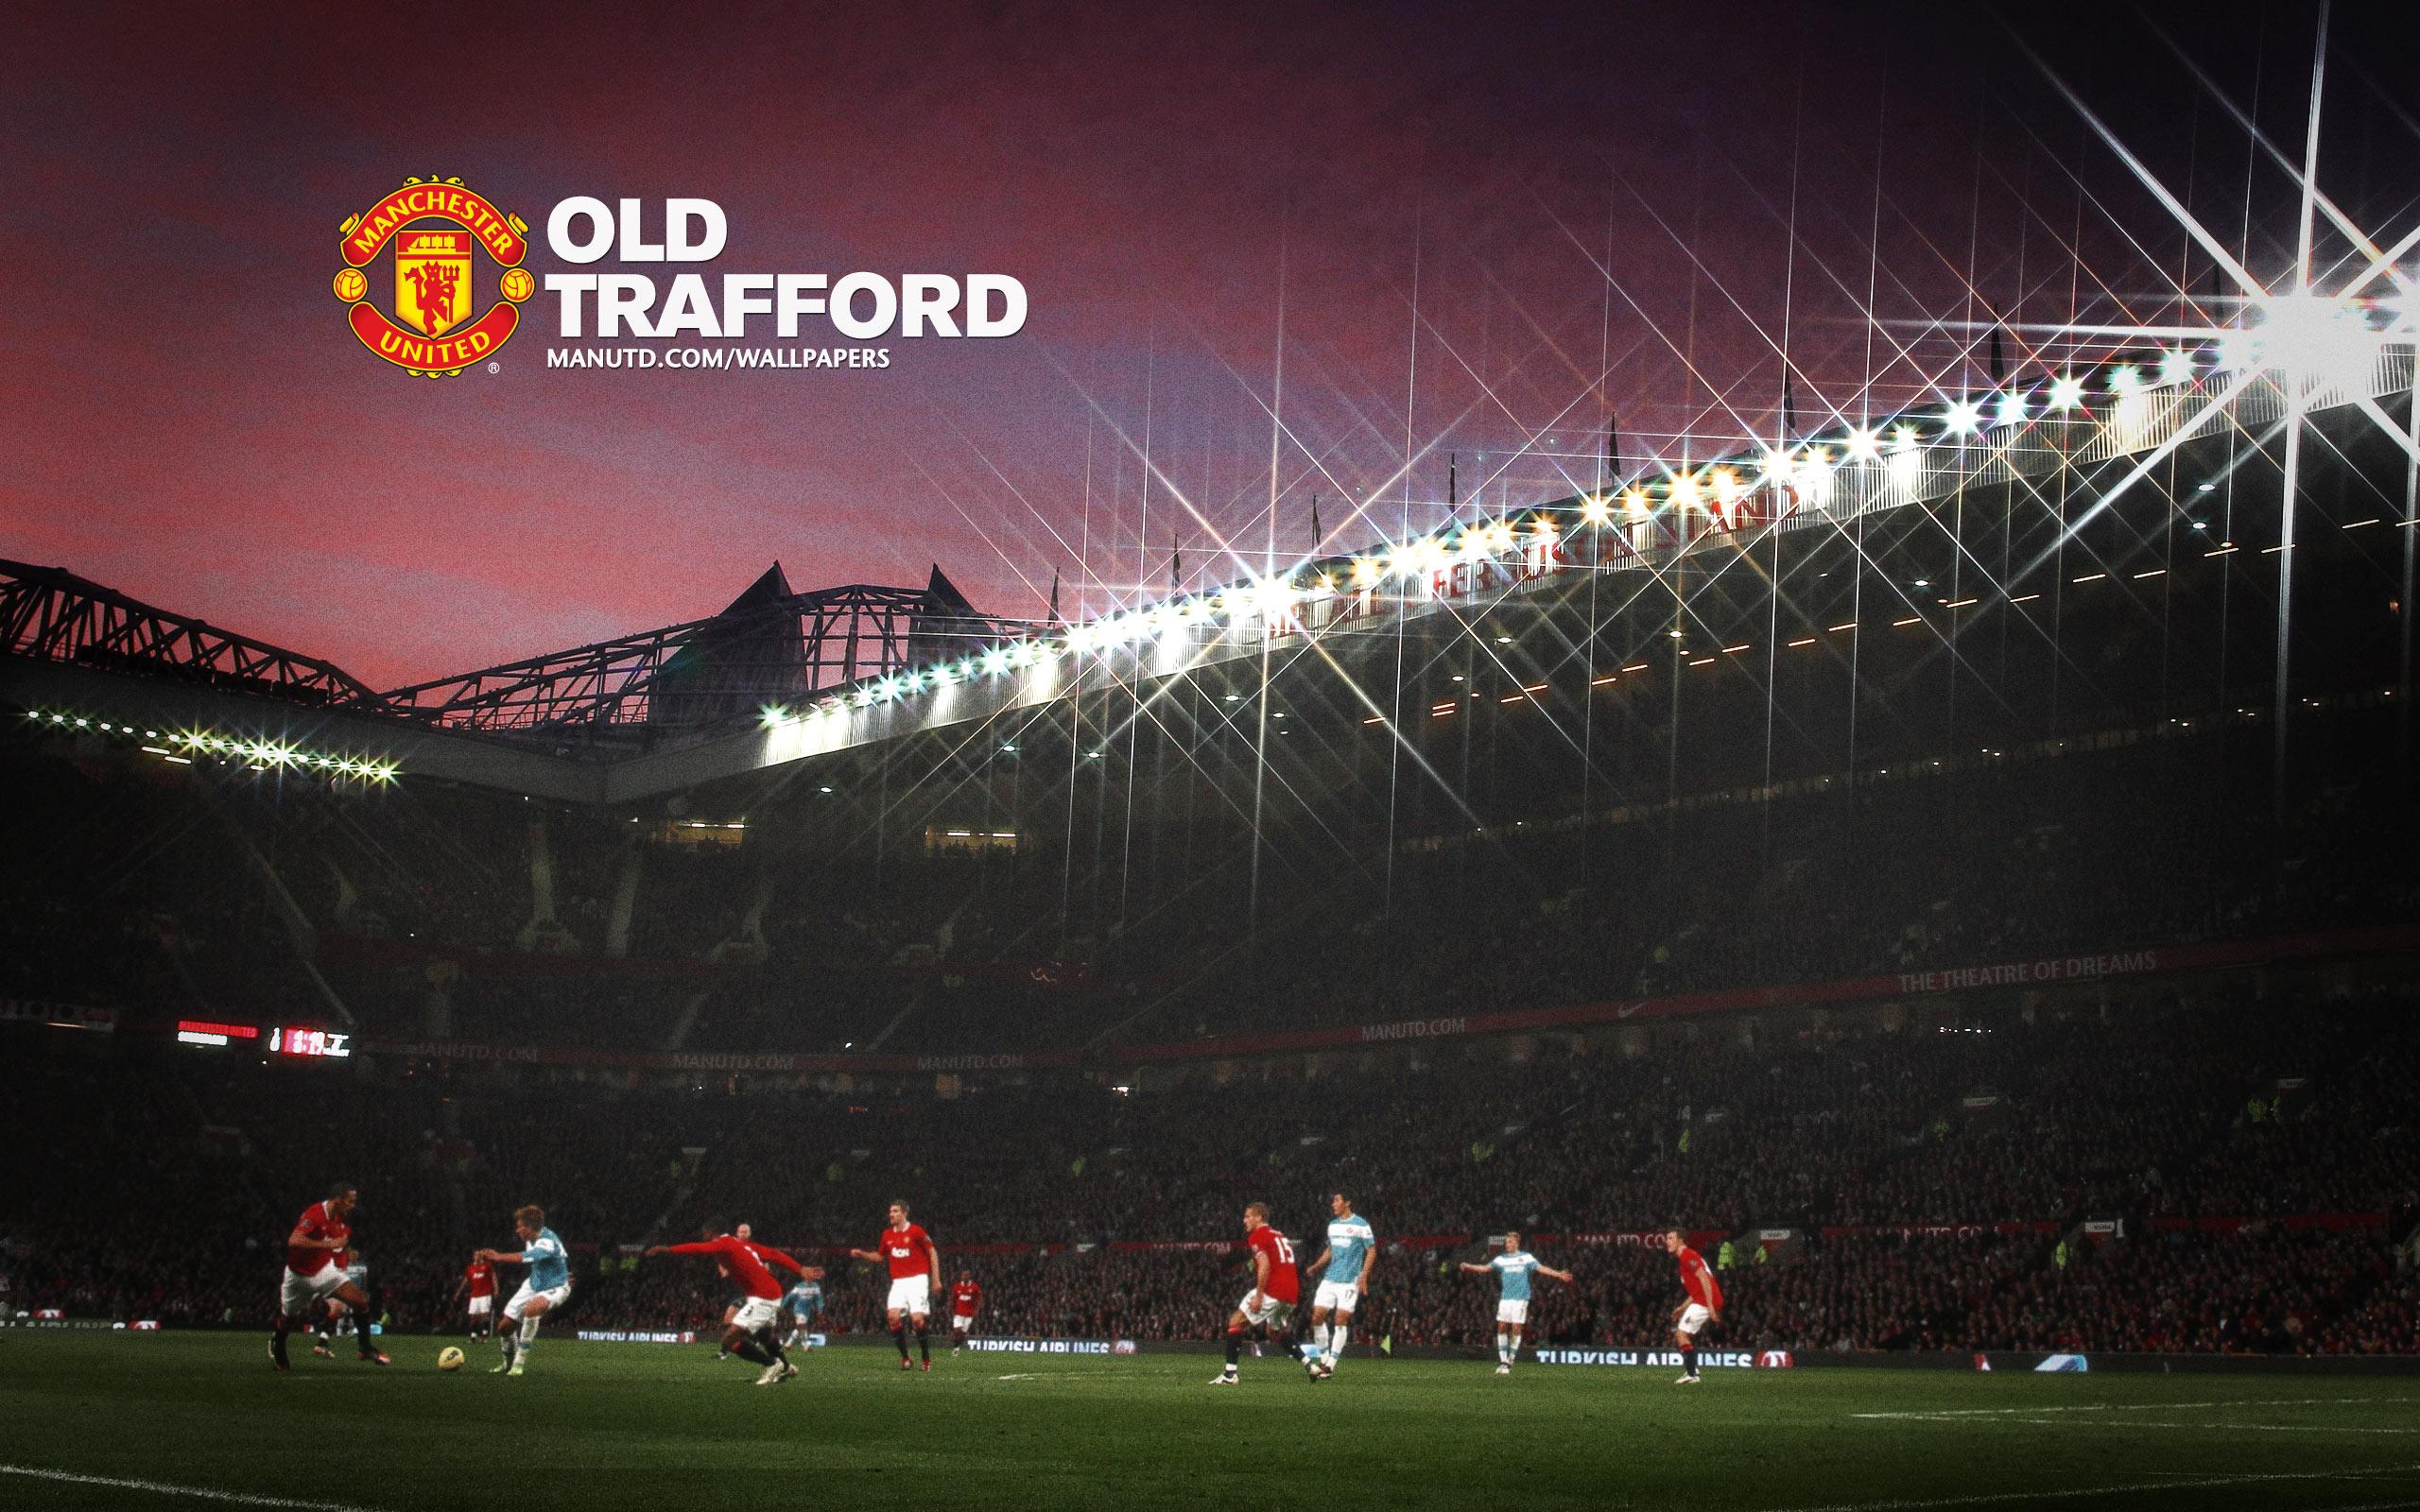 Man Utd Wallpaper Old Trafford 2560x1600 Download Hd Wallpaper Wallpapertip